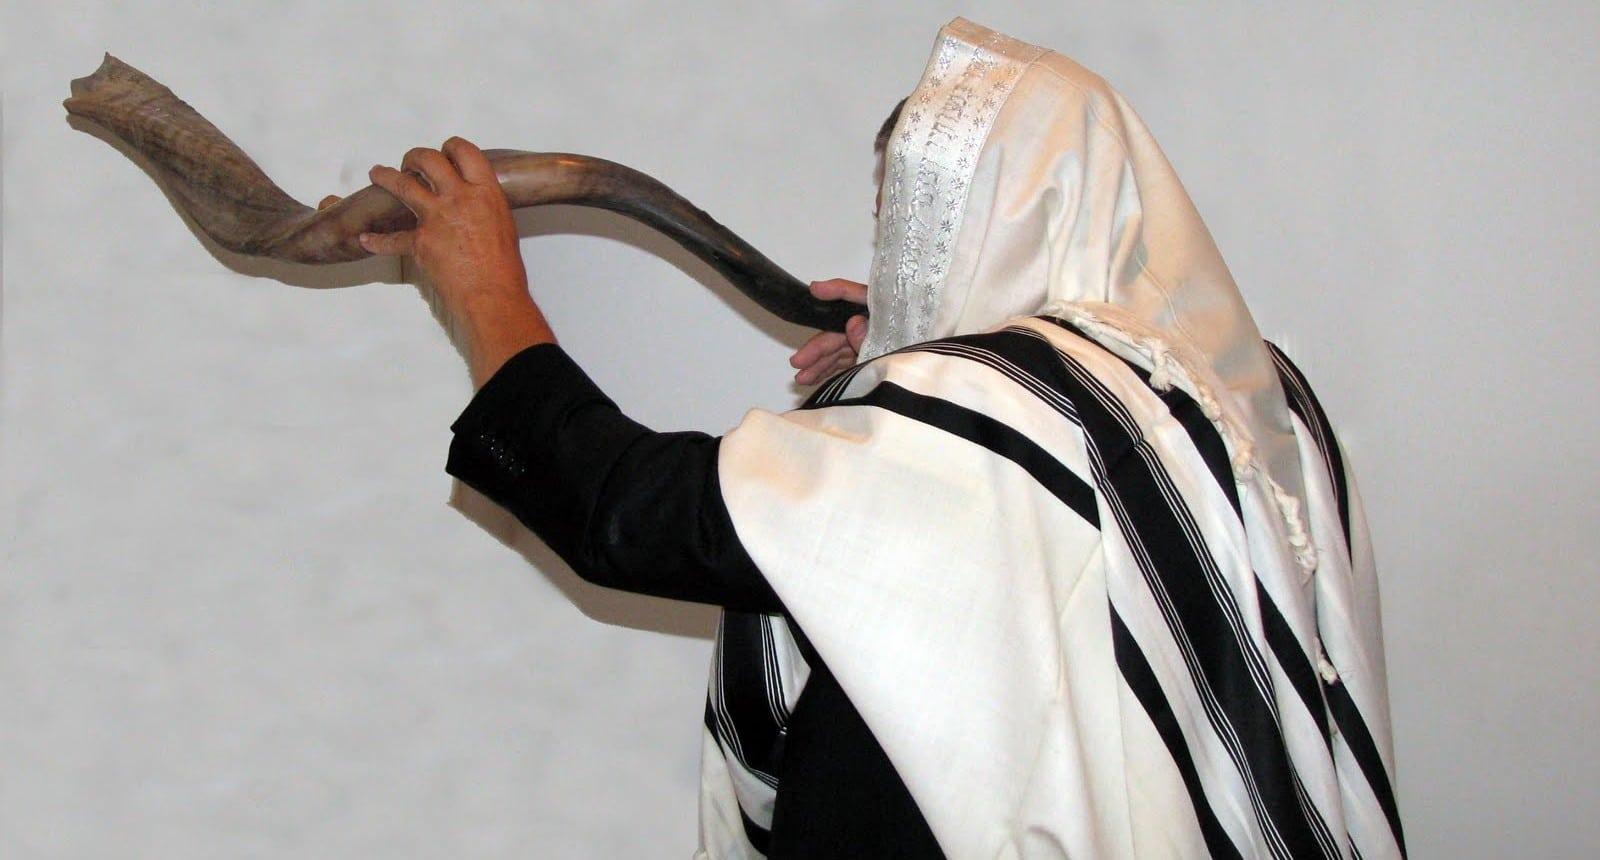 Le son du Chofar. Explications et analyses sur Roch Hachana 3.  M. Baruch